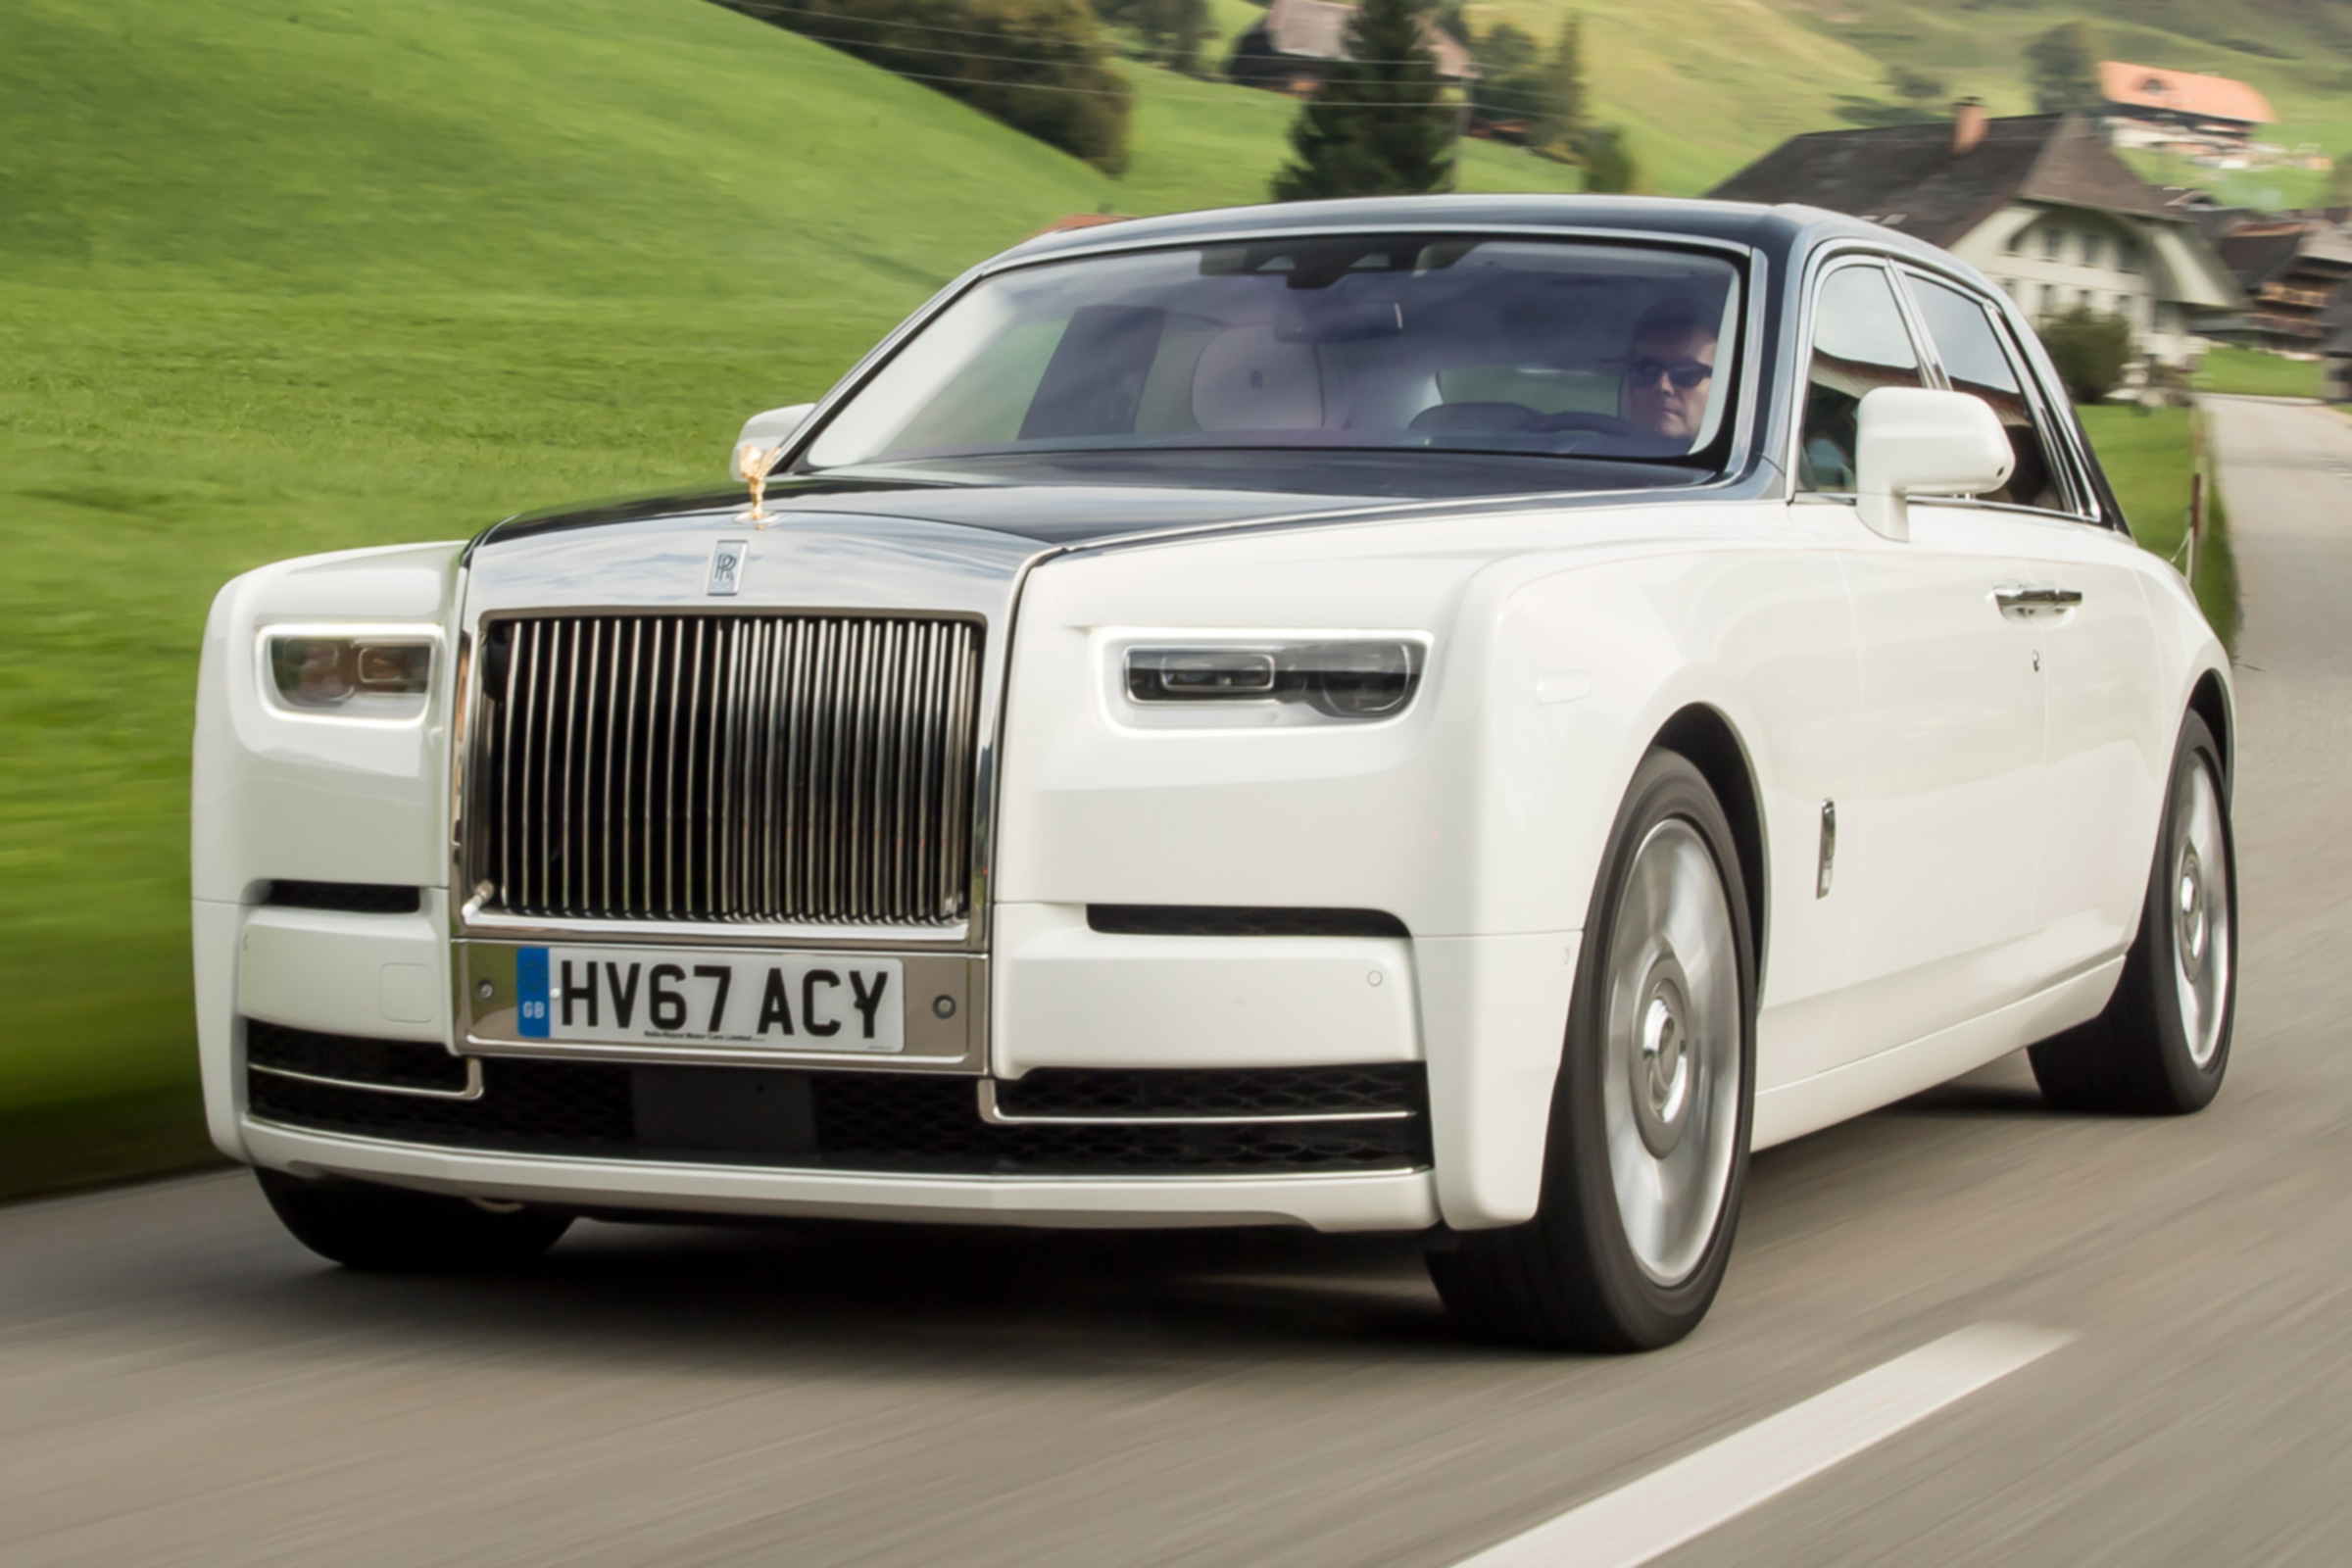 Rolls Royce Phantom Most Comfortable Cars Auto Express